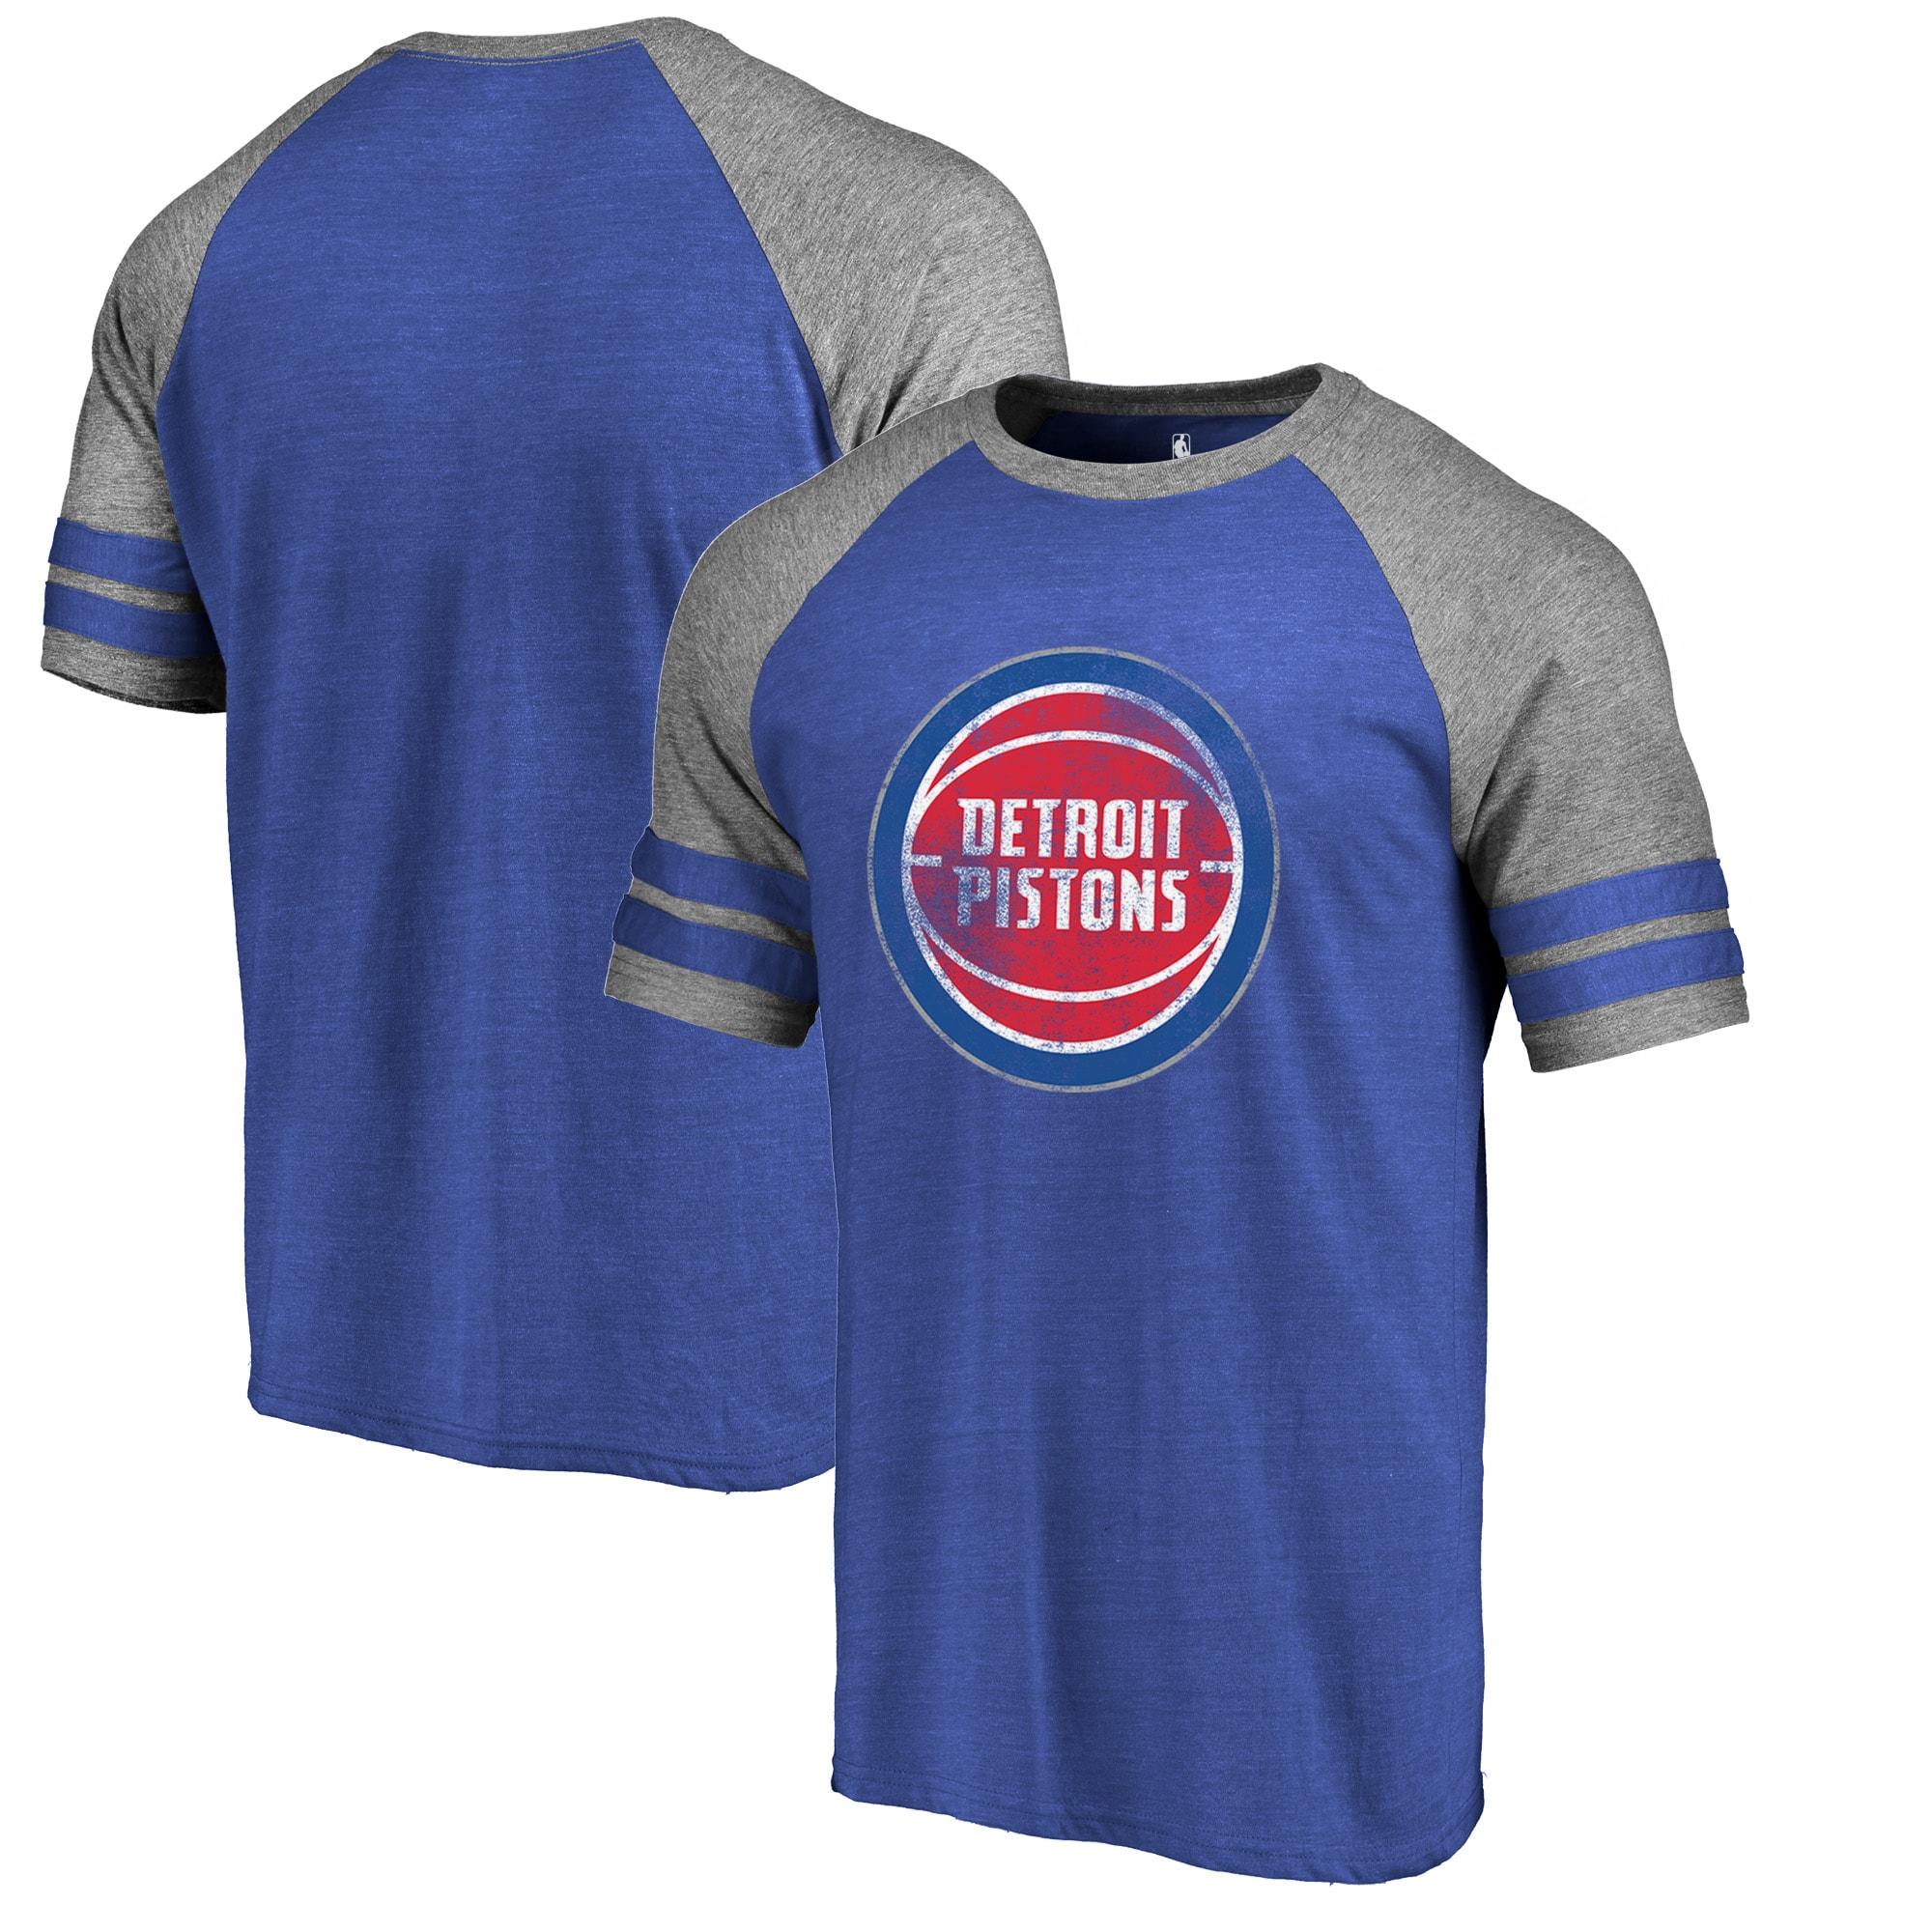 Detroit Pistons Fanatics Branded Distressed Logo Raglan Tri-Blend T-Shirt - Royal